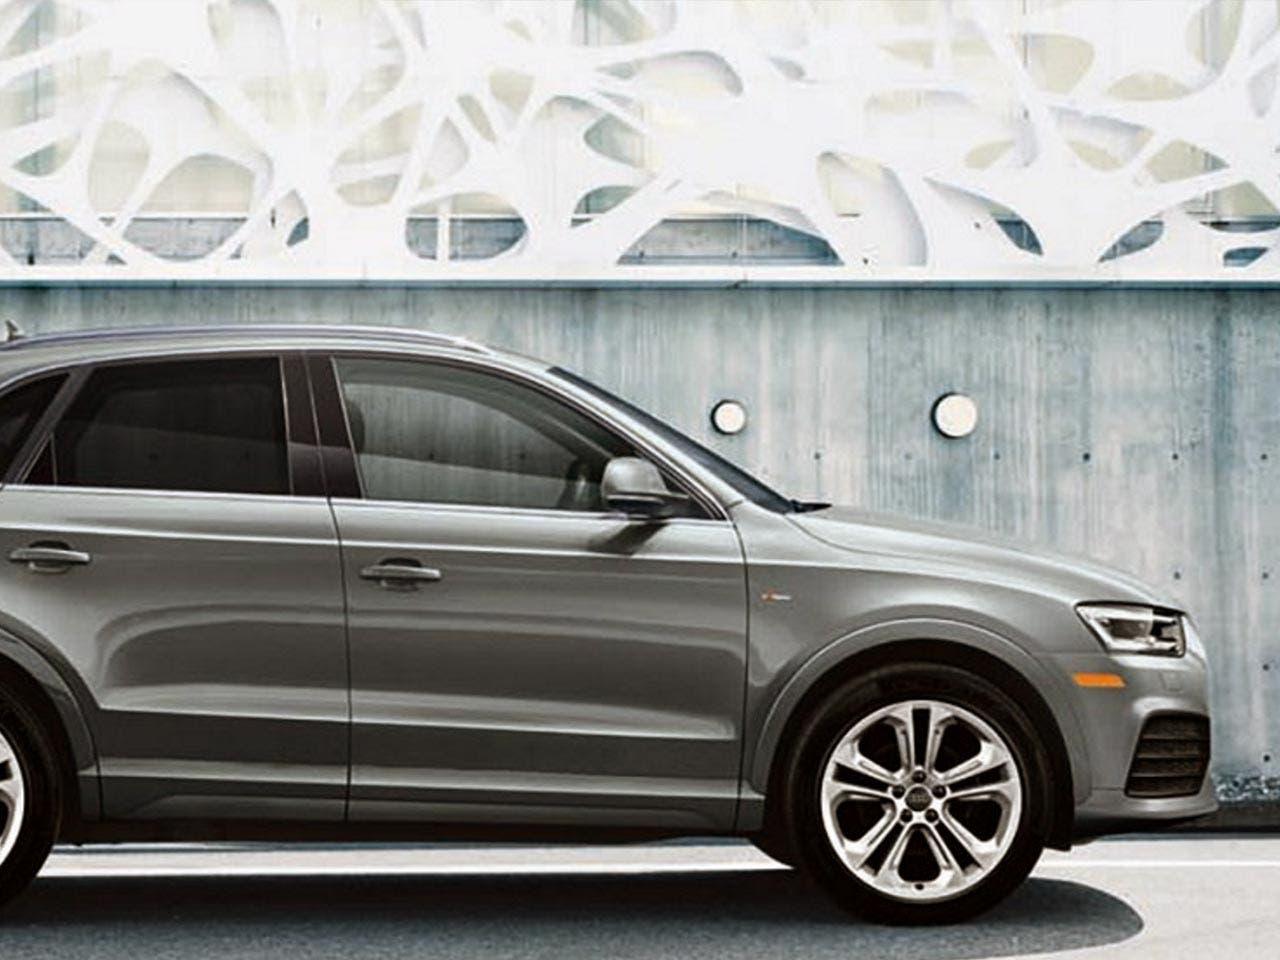 Silver Audi Q7